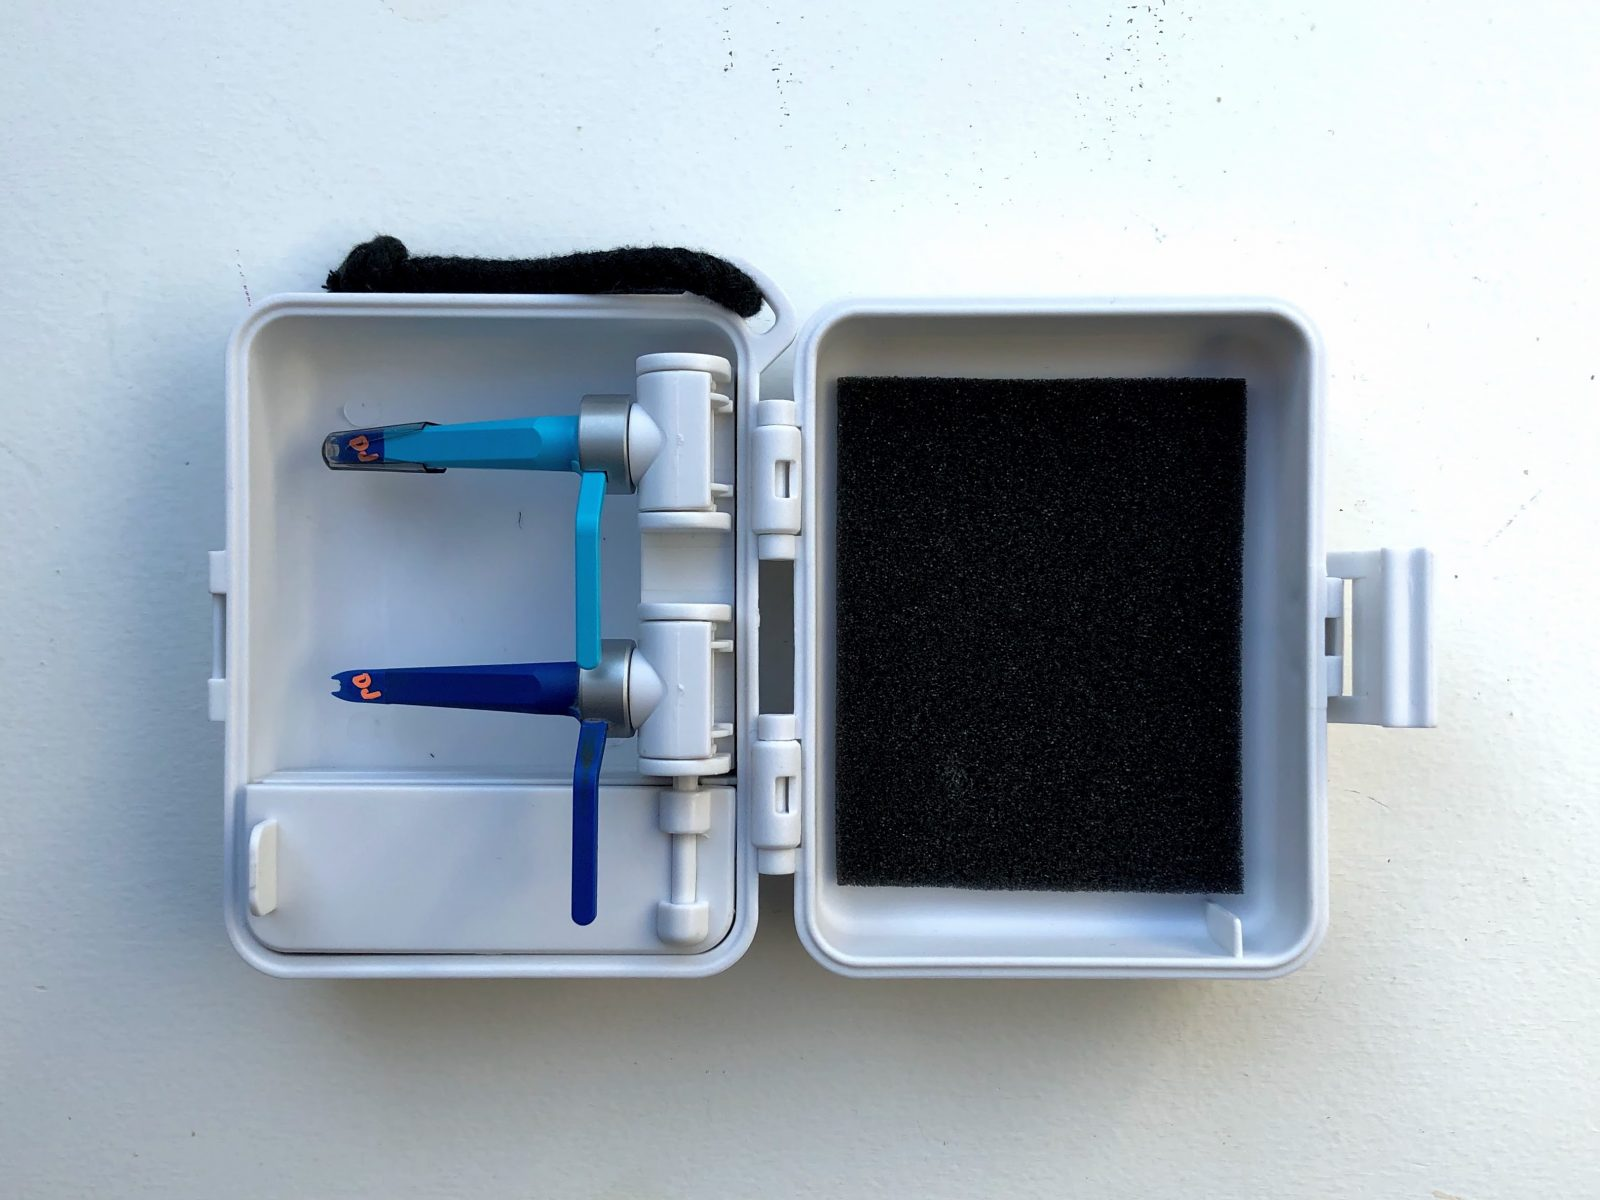 Stokyo Black Box Cartridge Case mit Ortofon Systemen